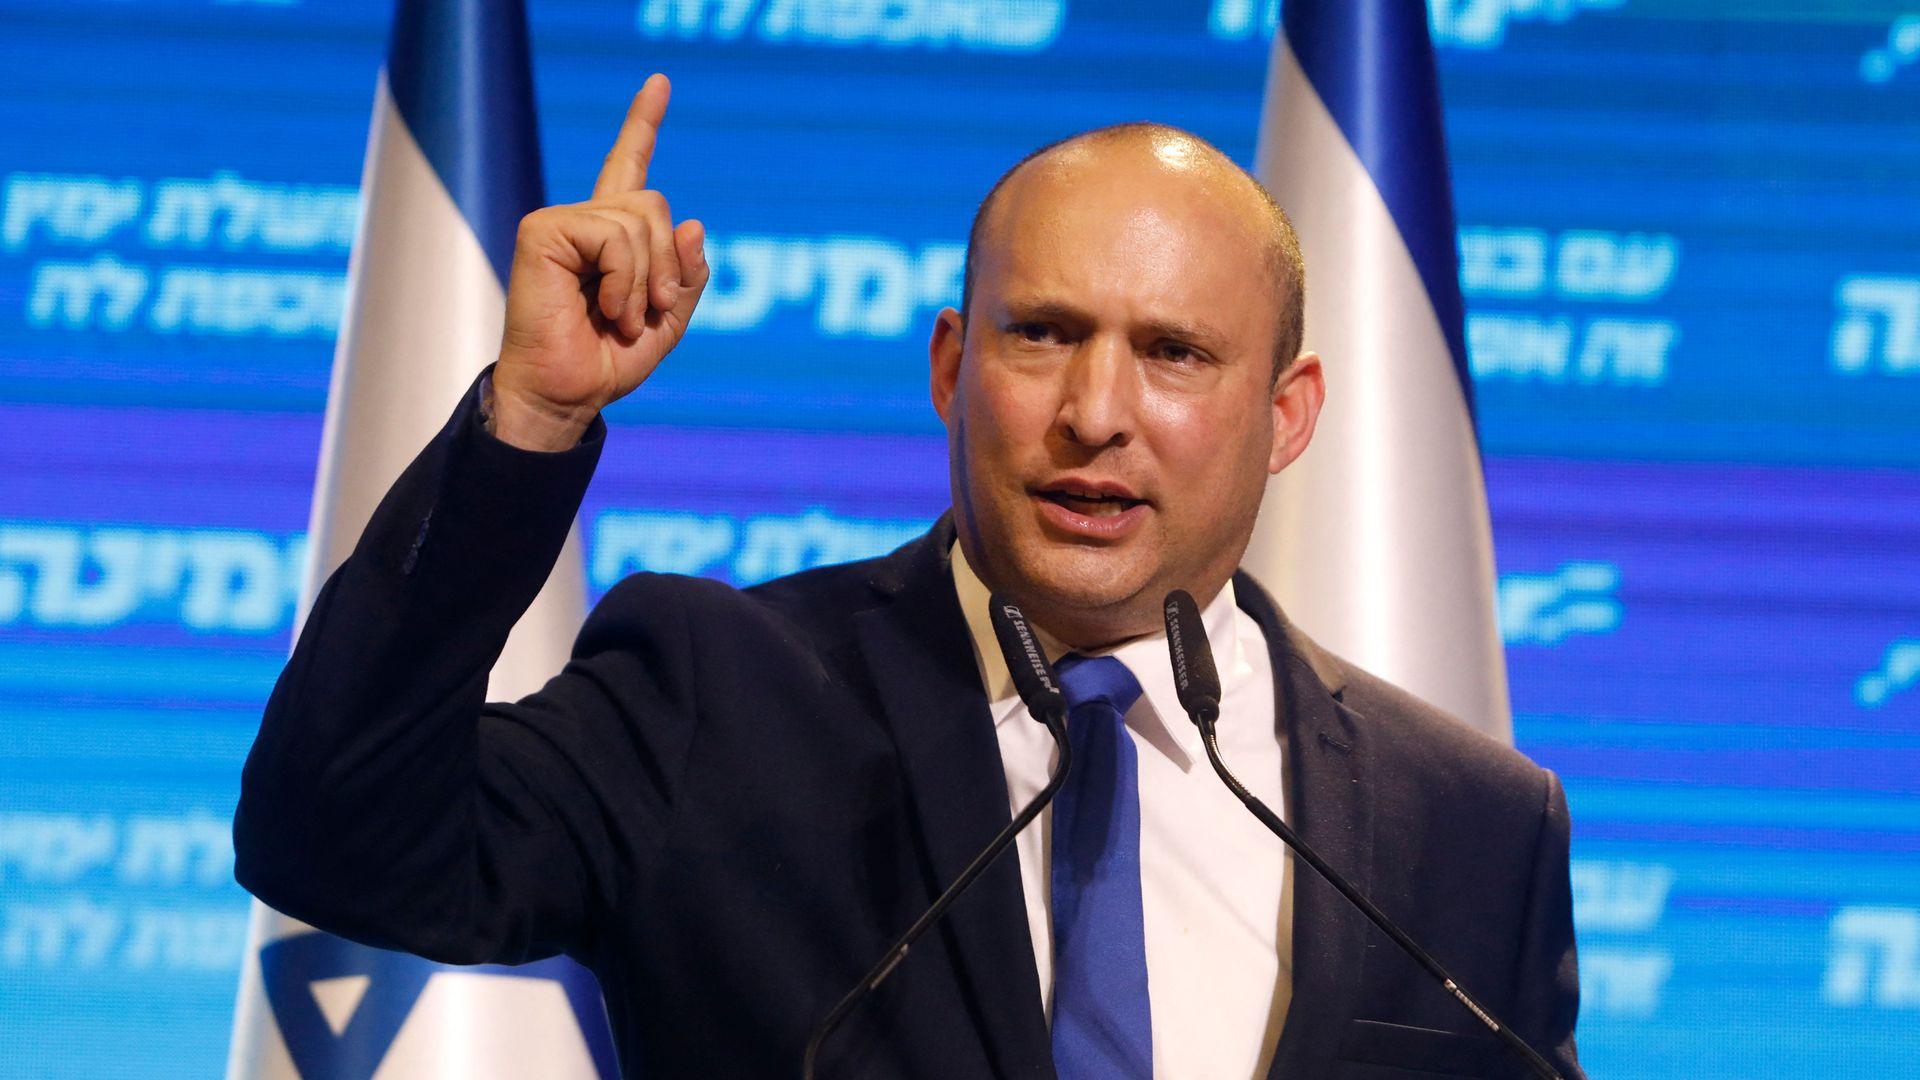 Naftali Bennett, leader of the Israeli right-wing Yamina ('New Right') party